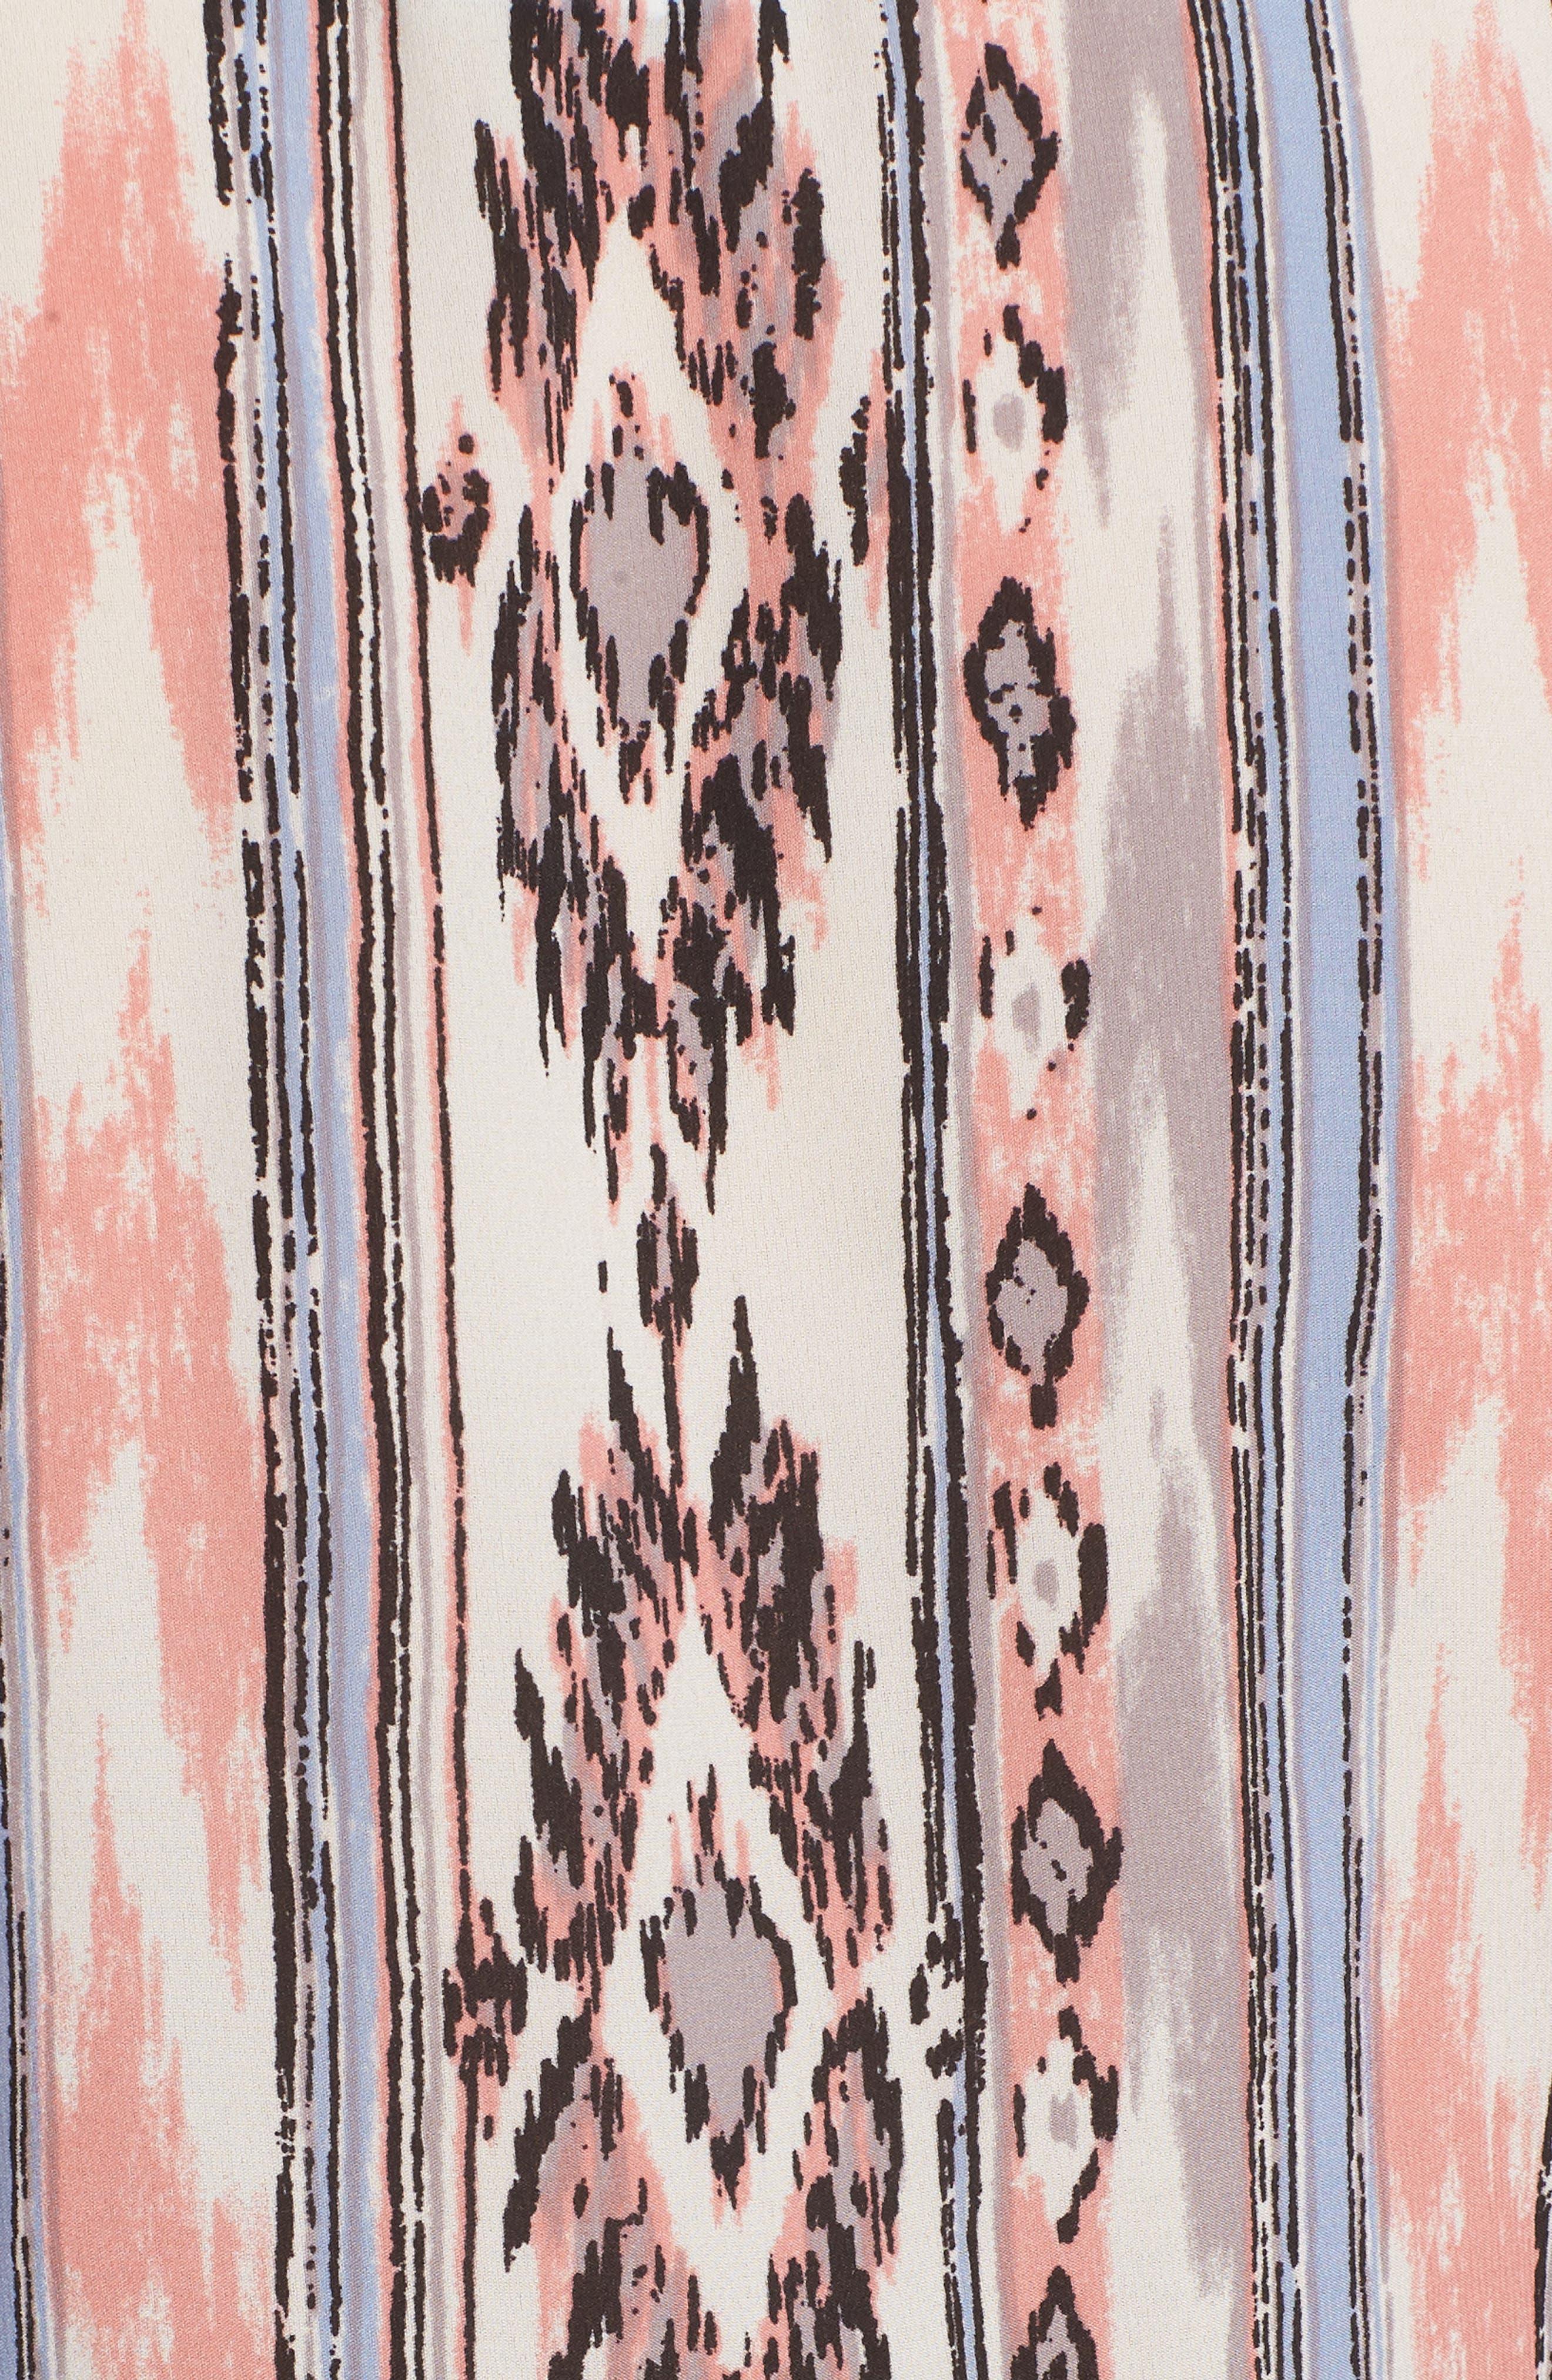 Adams Ruffled Sleeve Blouse,                             Alternate thumbnail 6, color,                             Multi